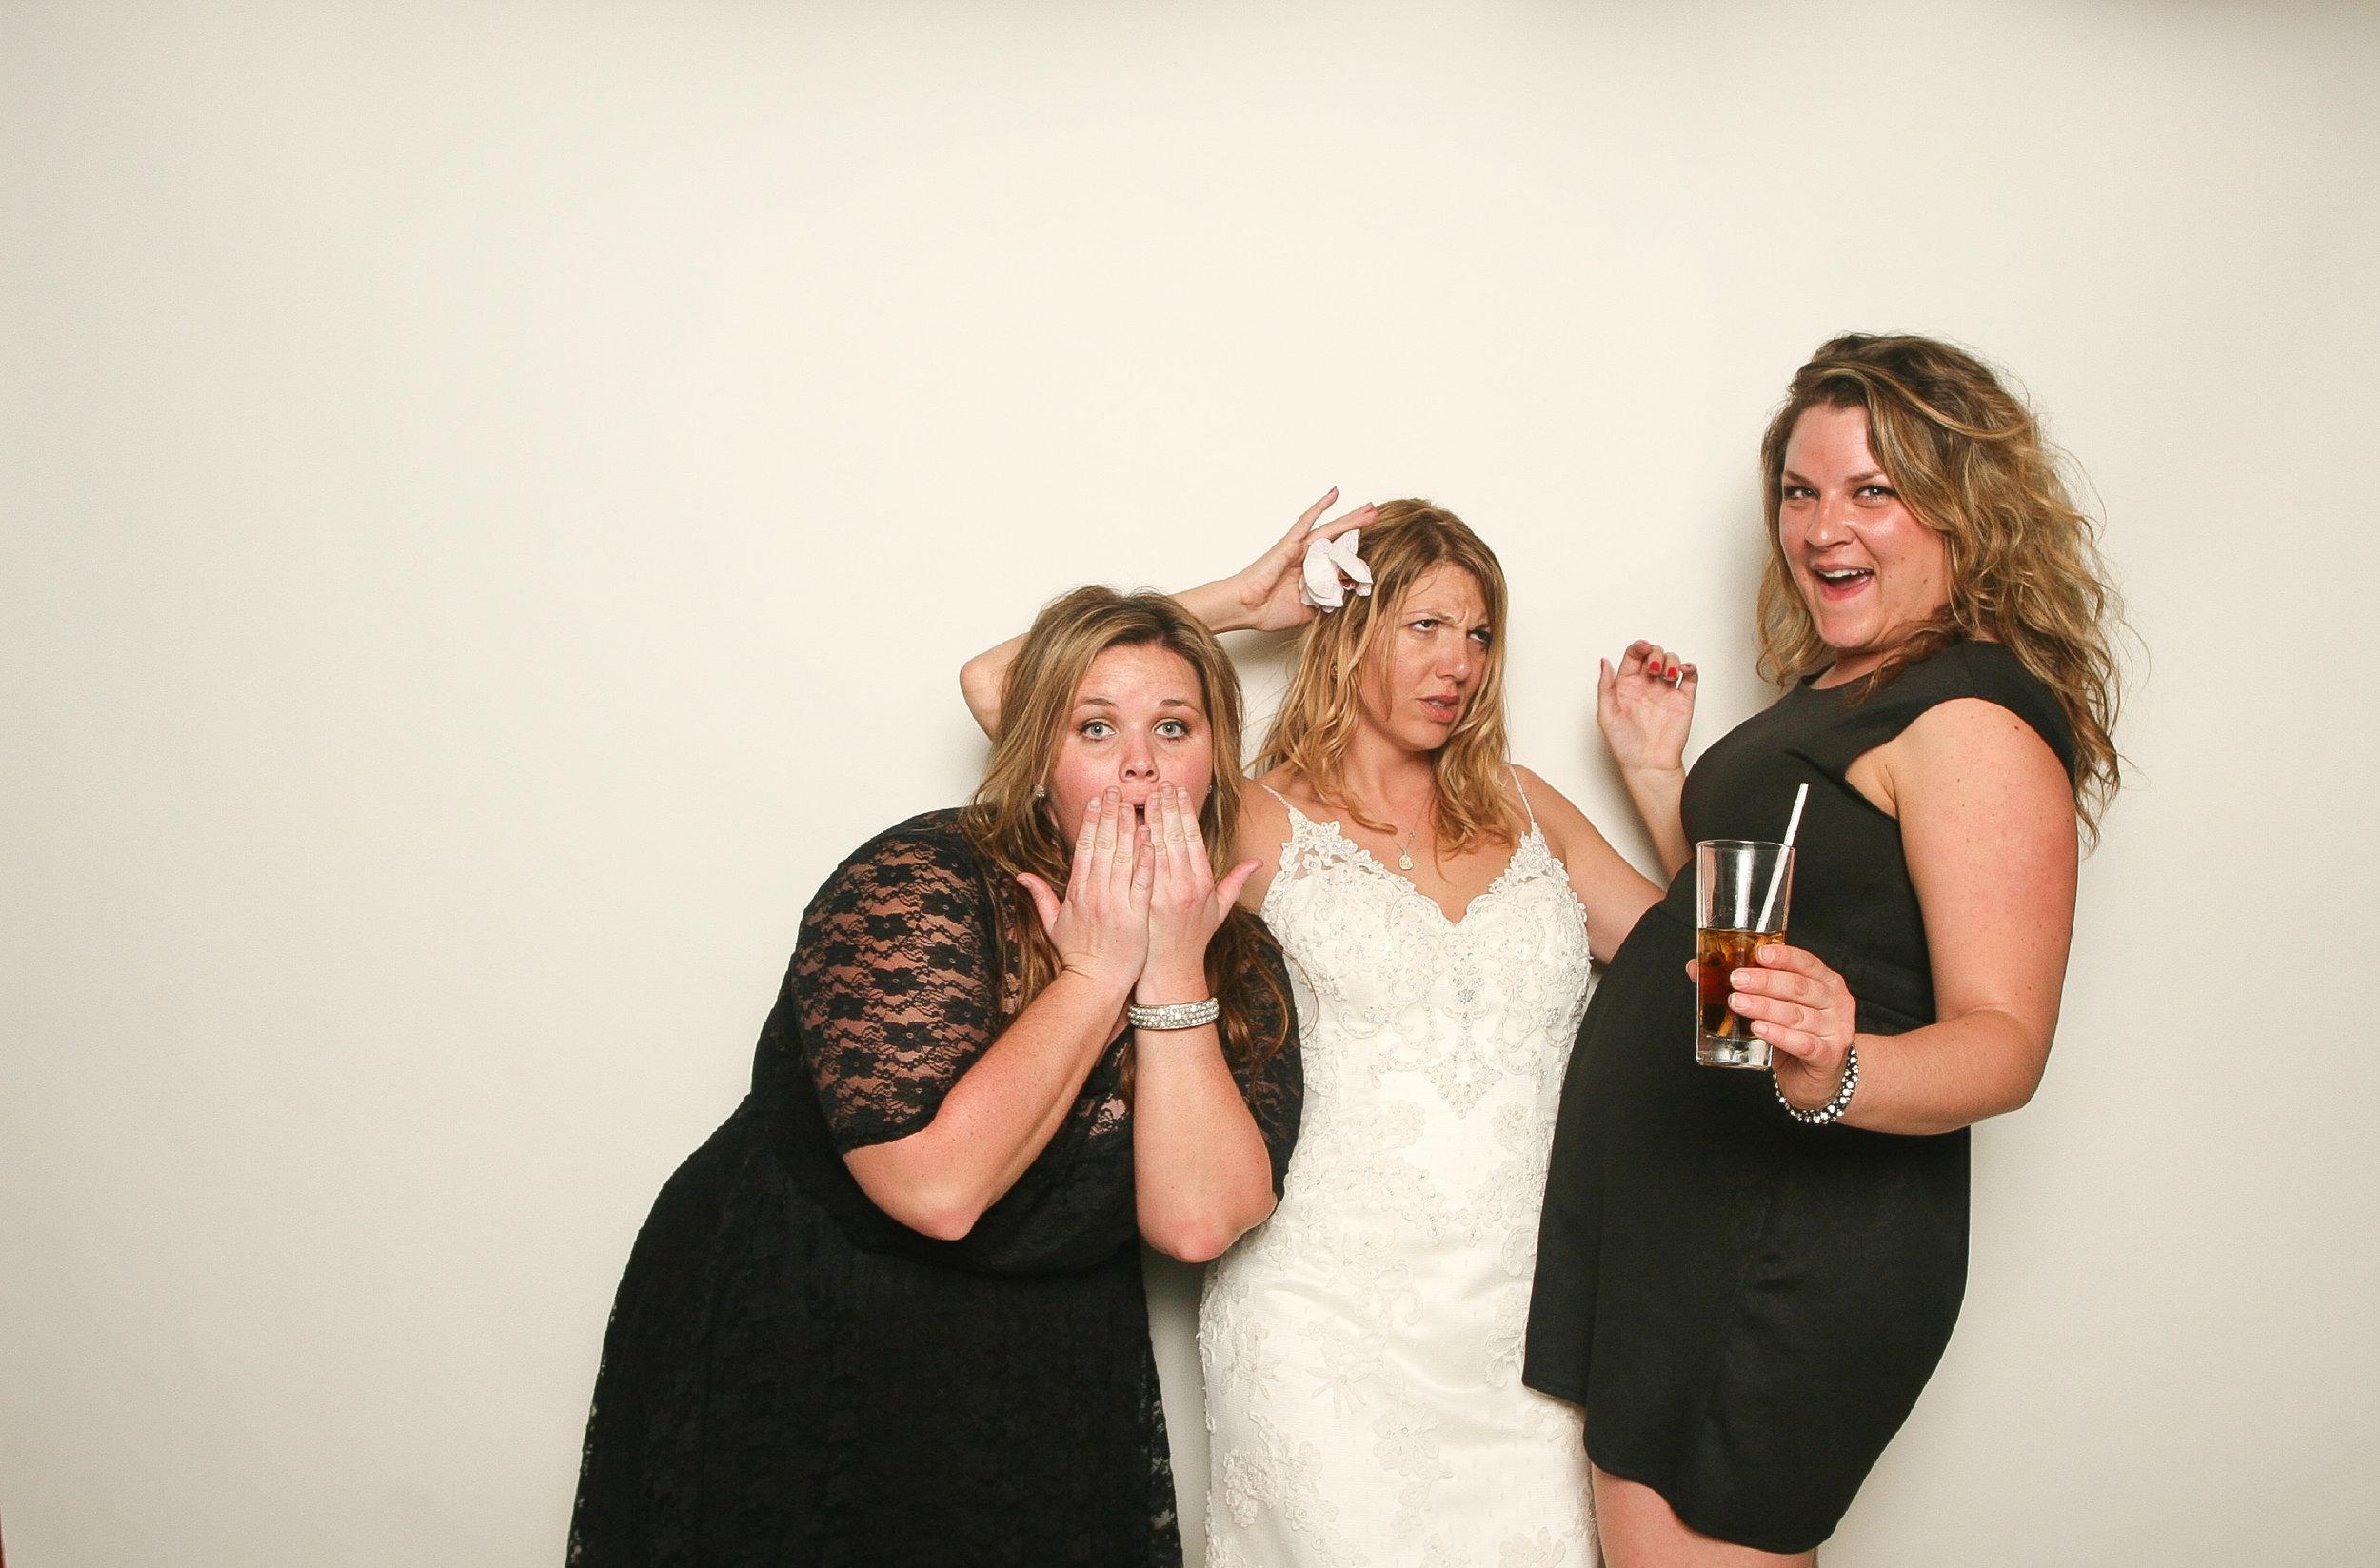 South Florida Miami Wedding Photobooth37.jpg